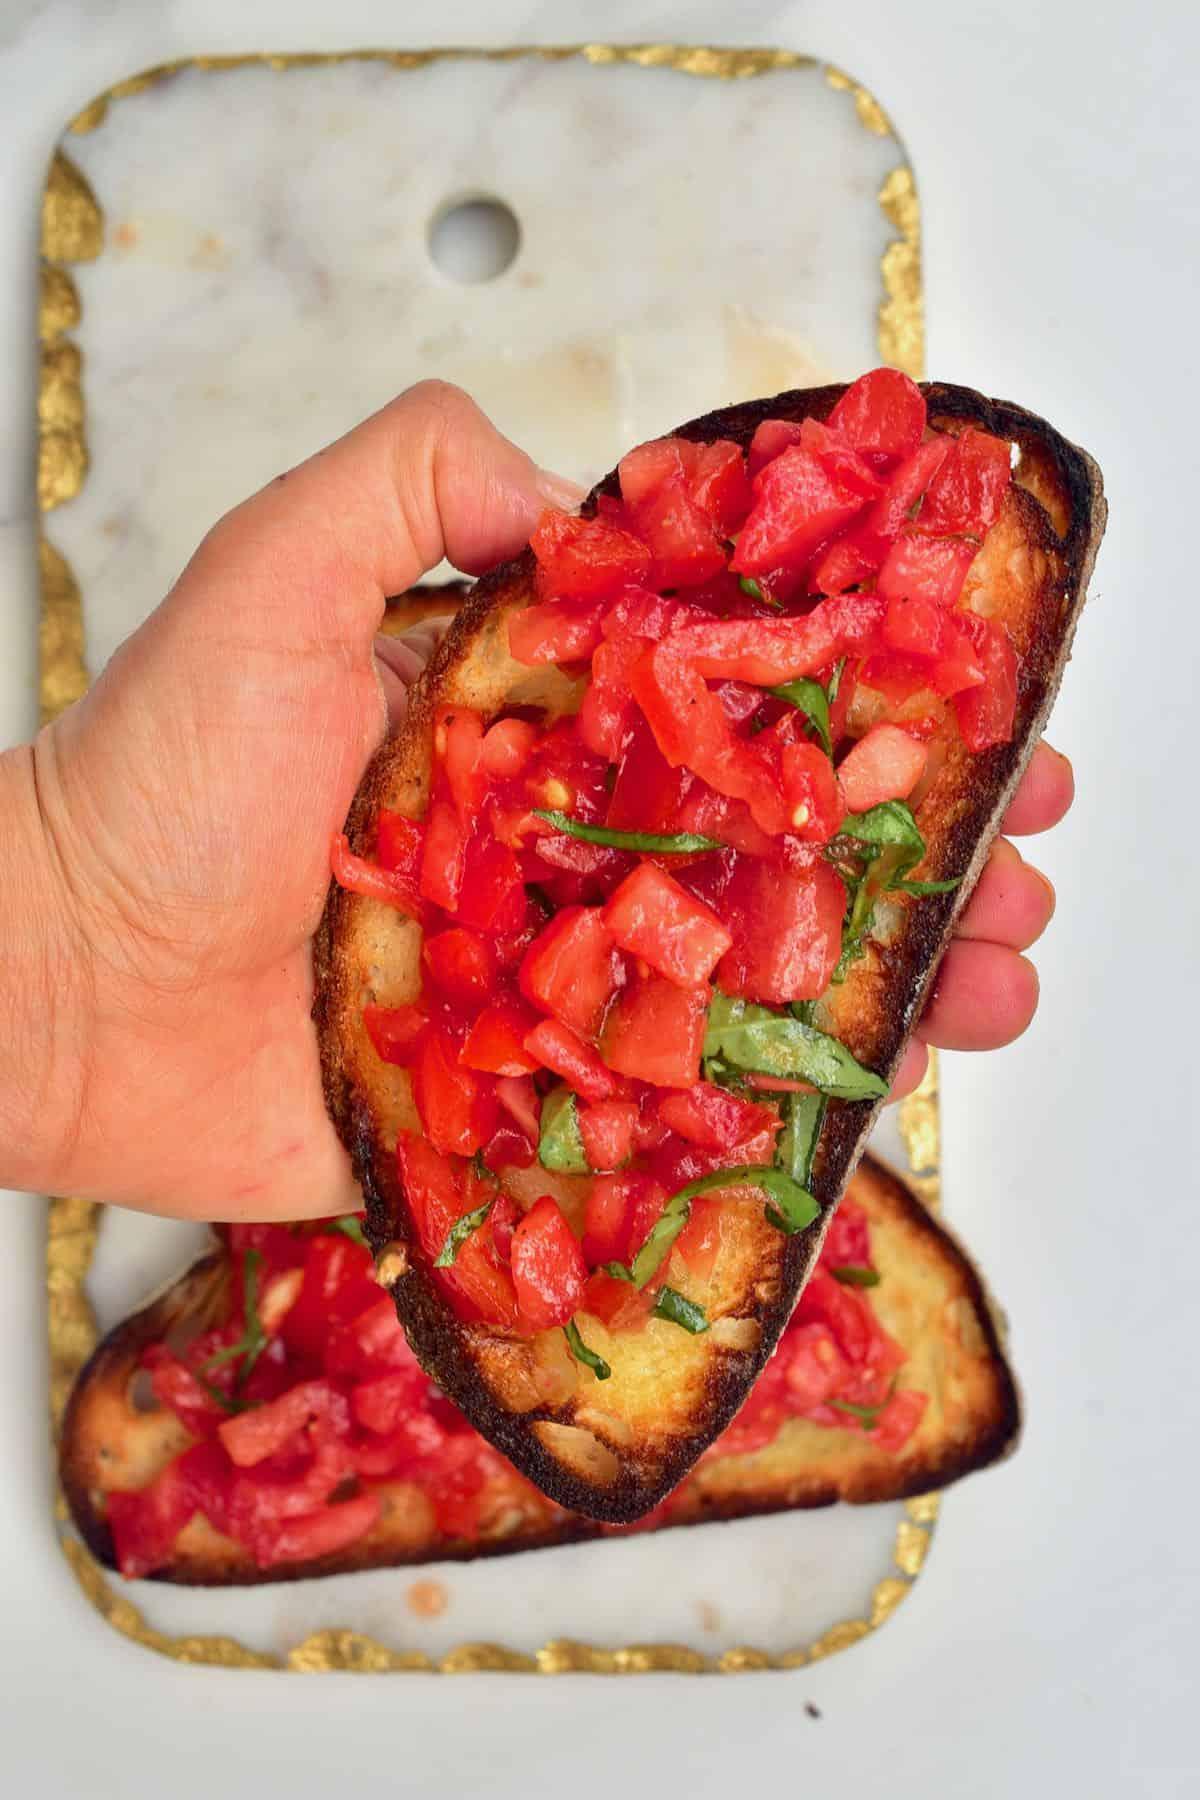 Hand holding a tomato bruschetta